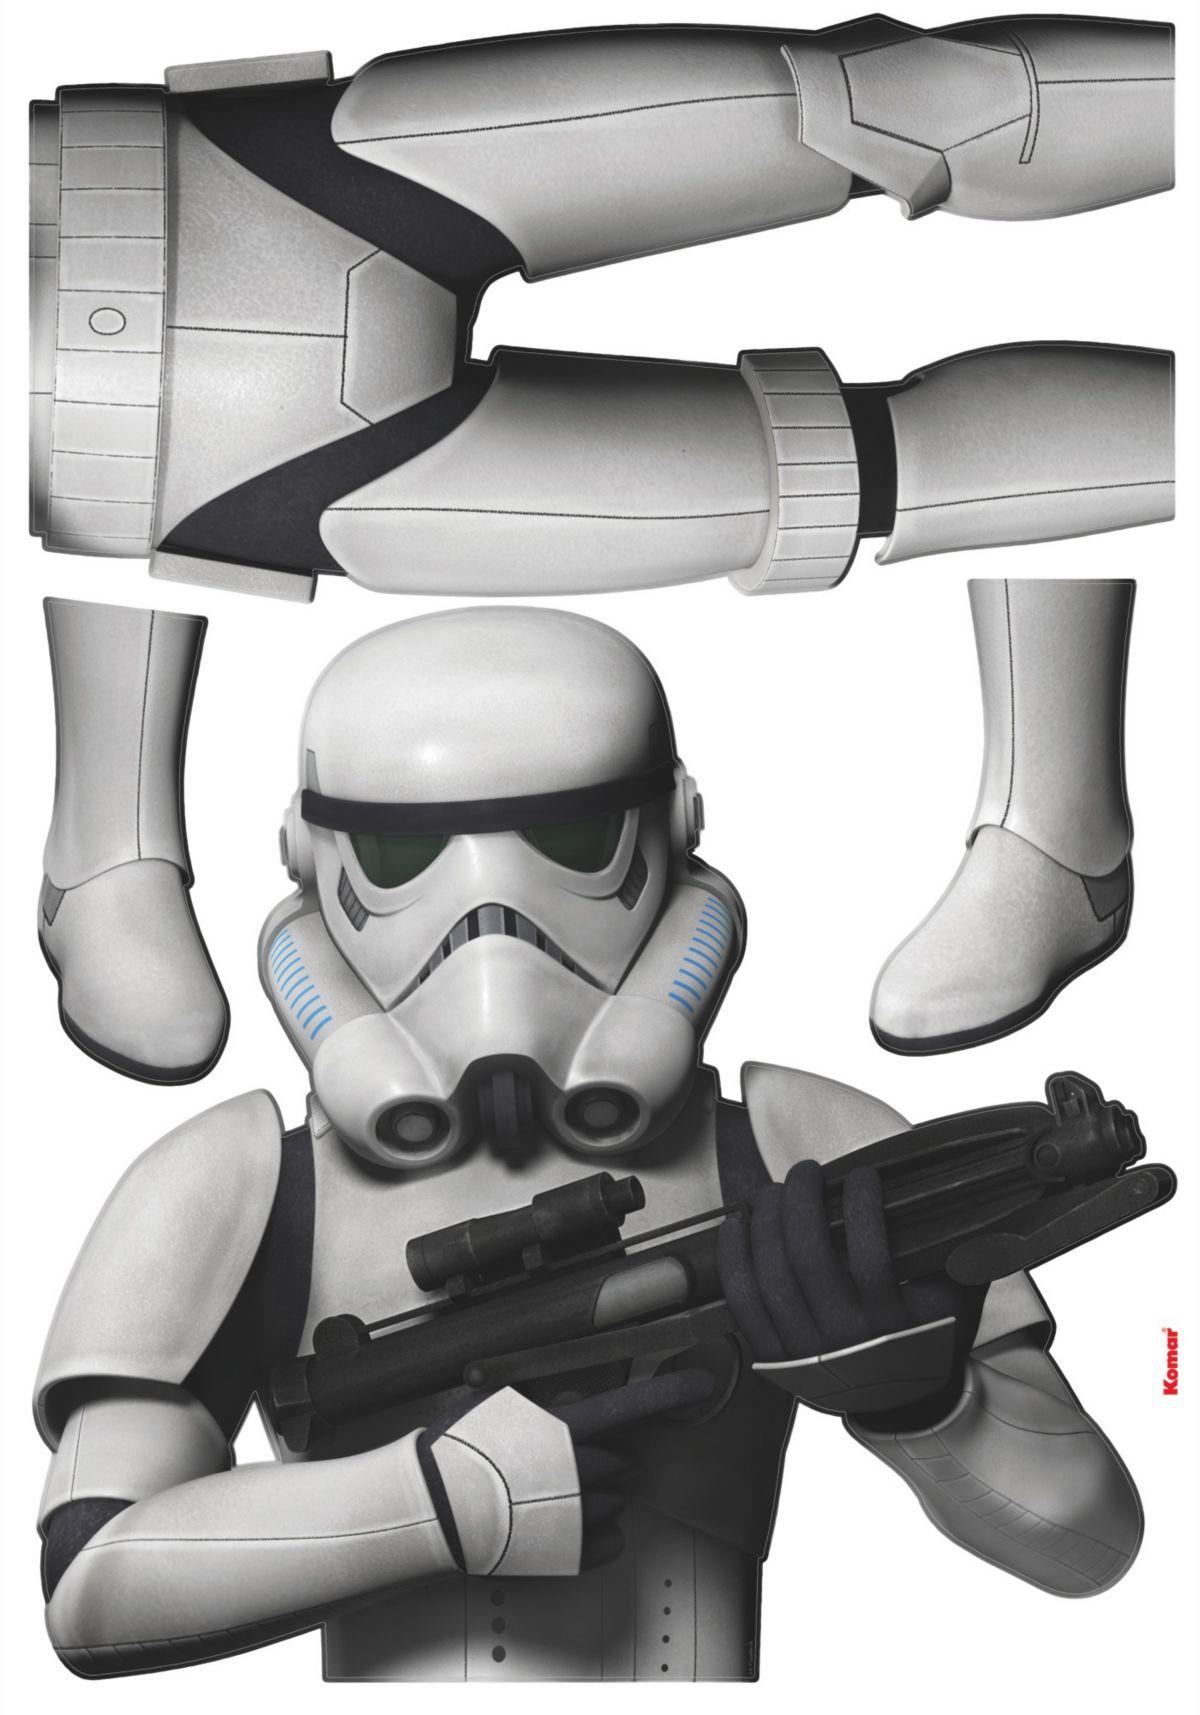 Wandsticker, Komar, »Star Wars Stormtrooper«, 70/160 cm